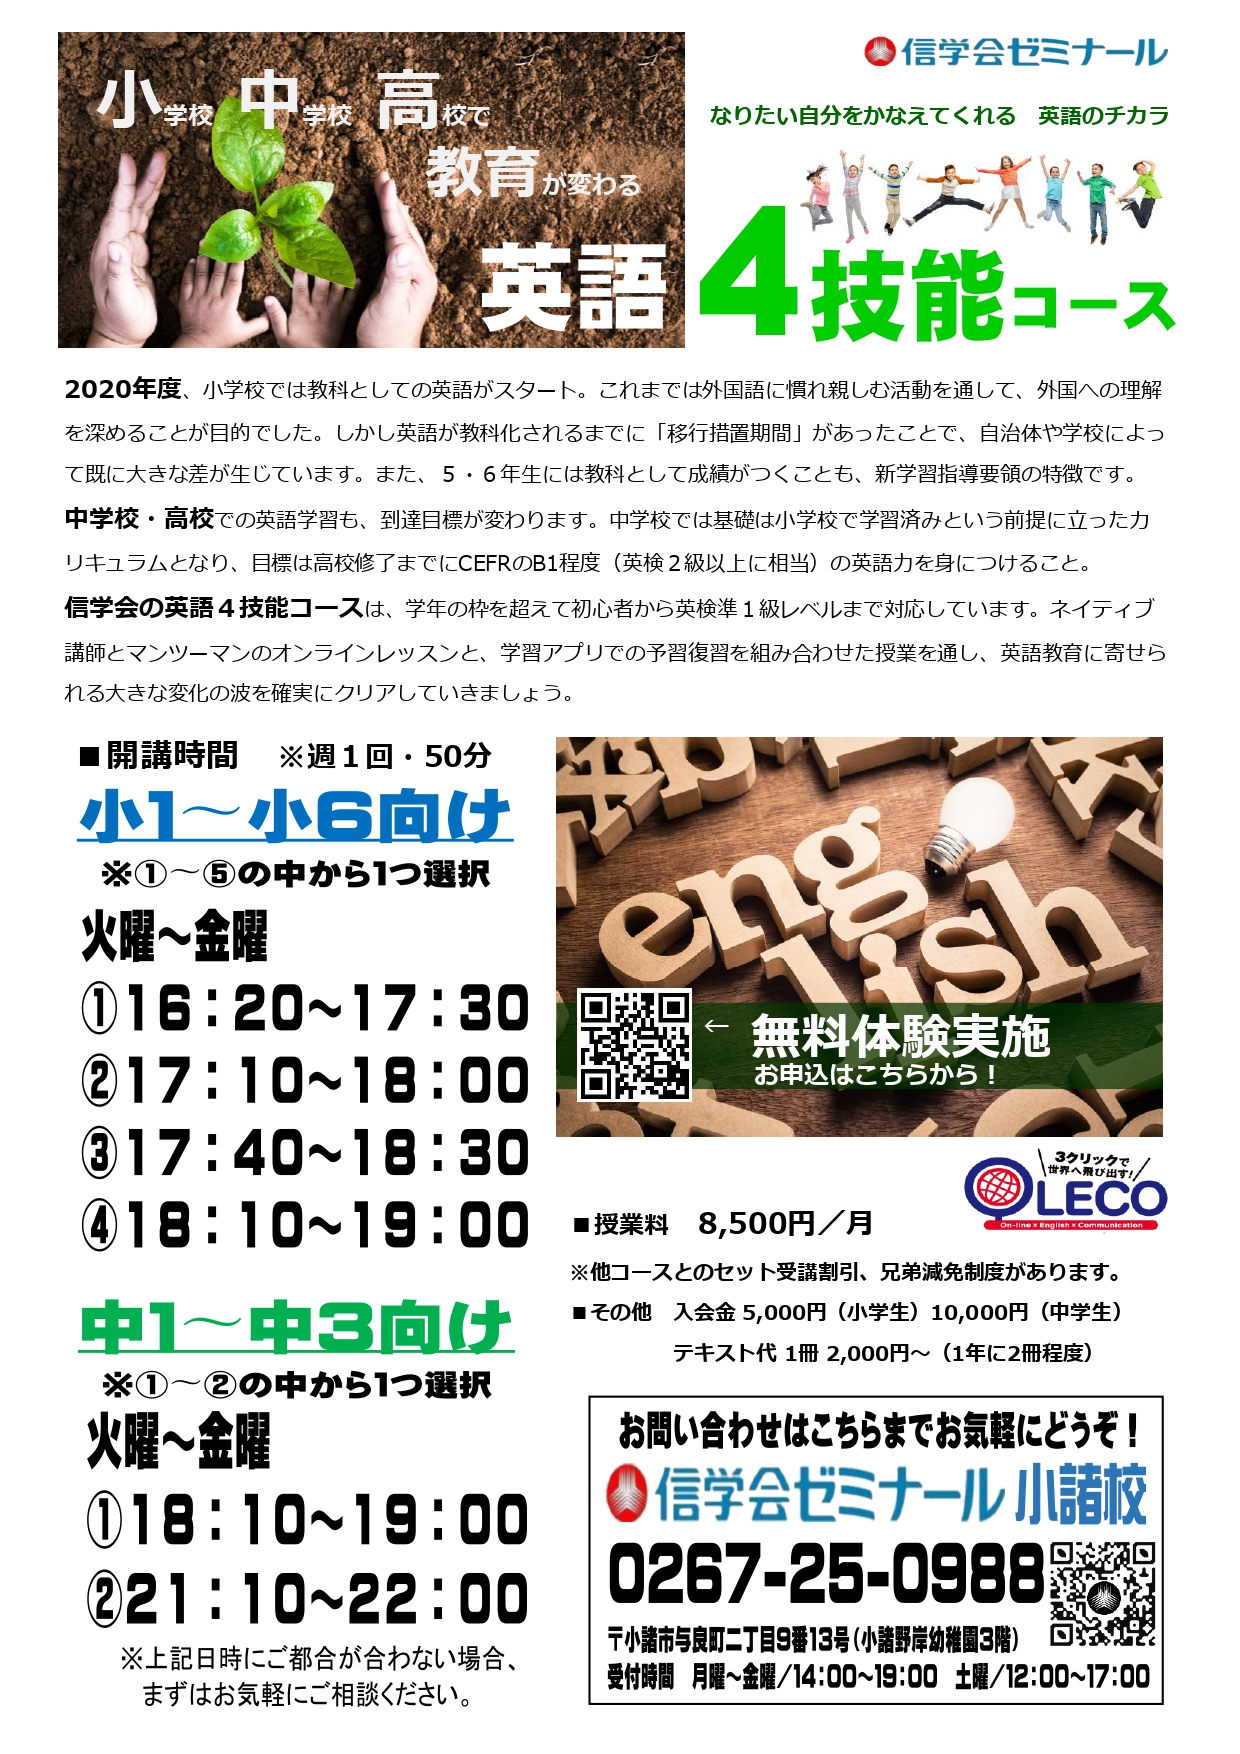 2020OLECO通年チラシ(小諸)_page-0001